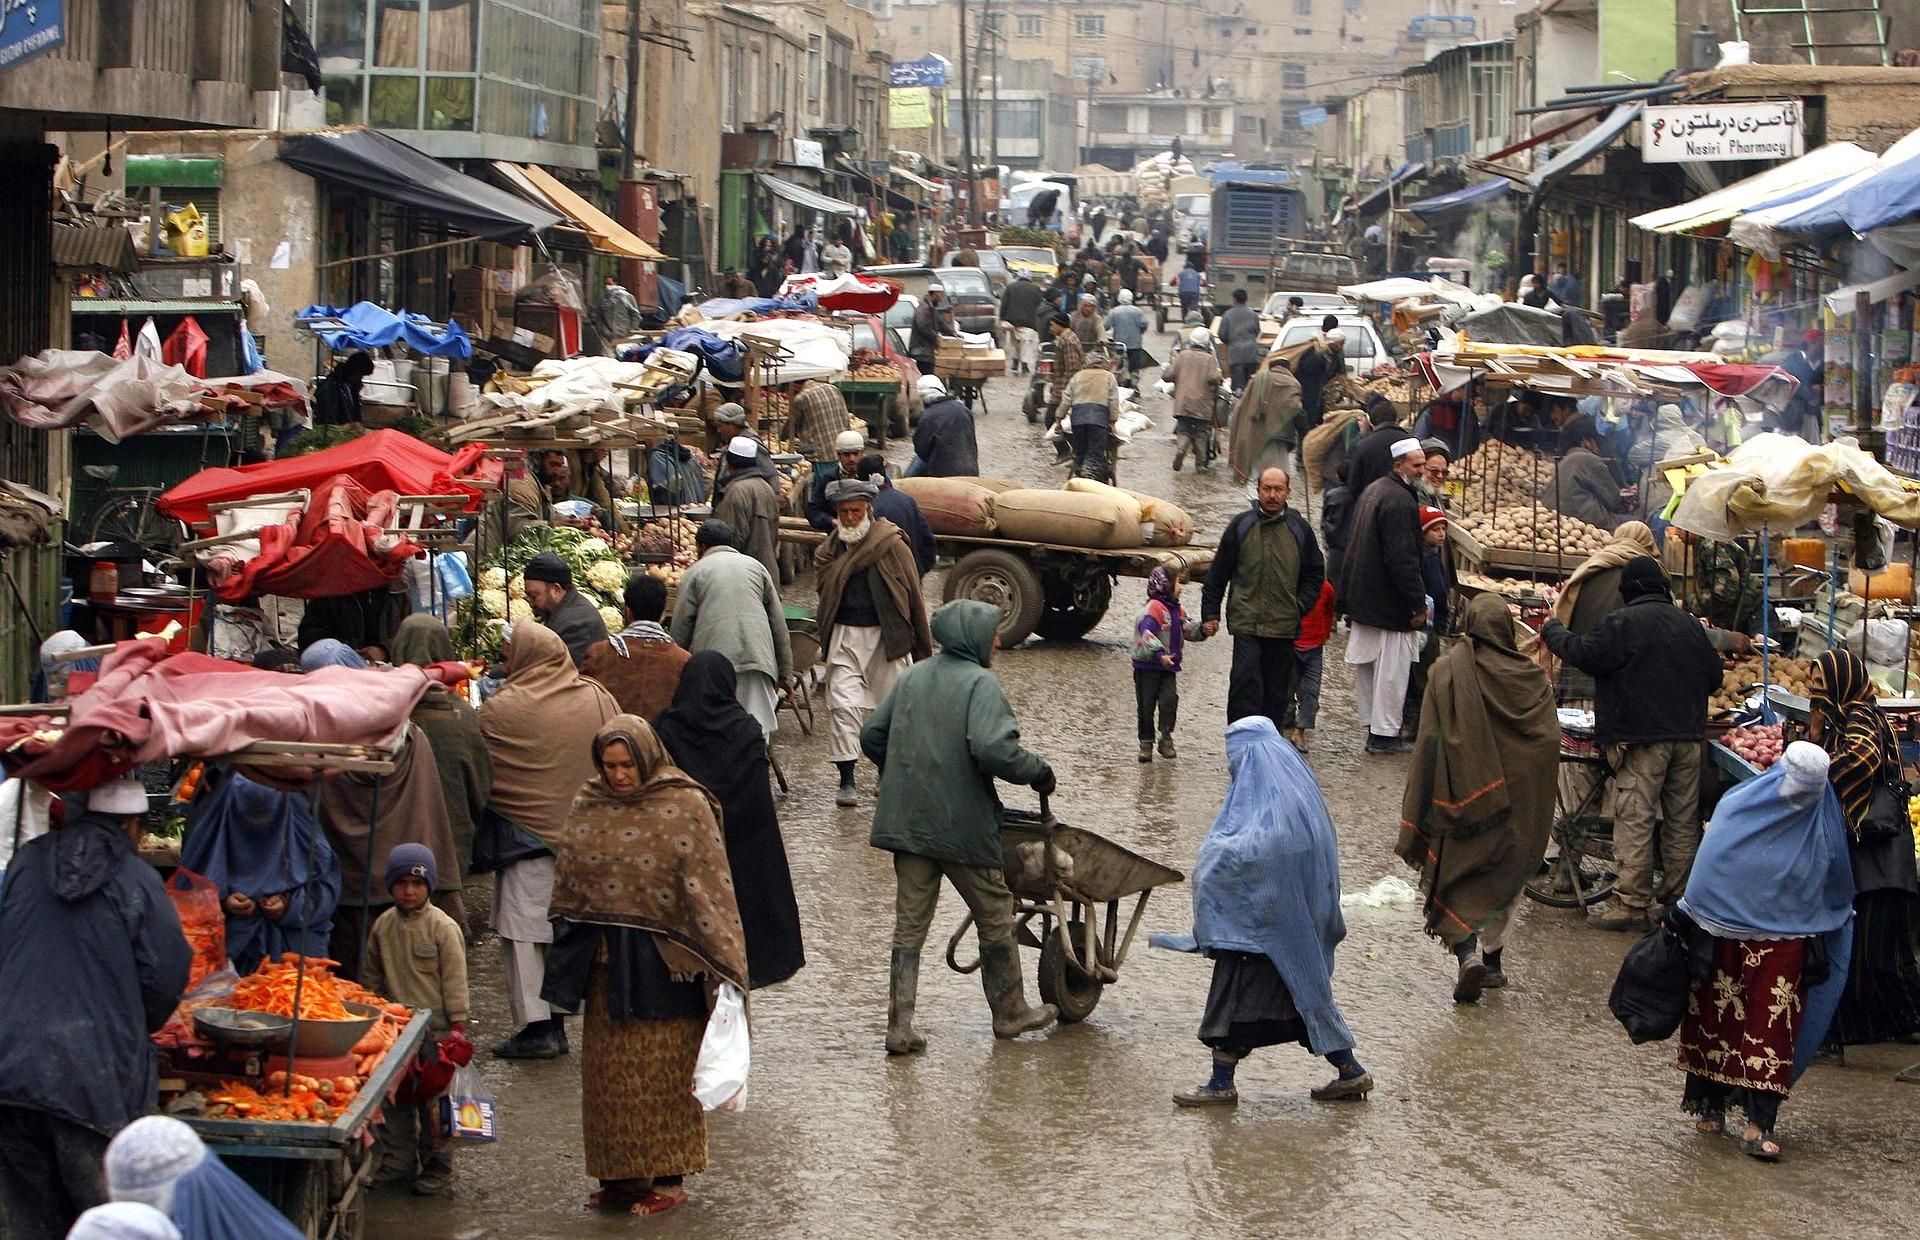 Afganistán, dos décadas de lucha continua